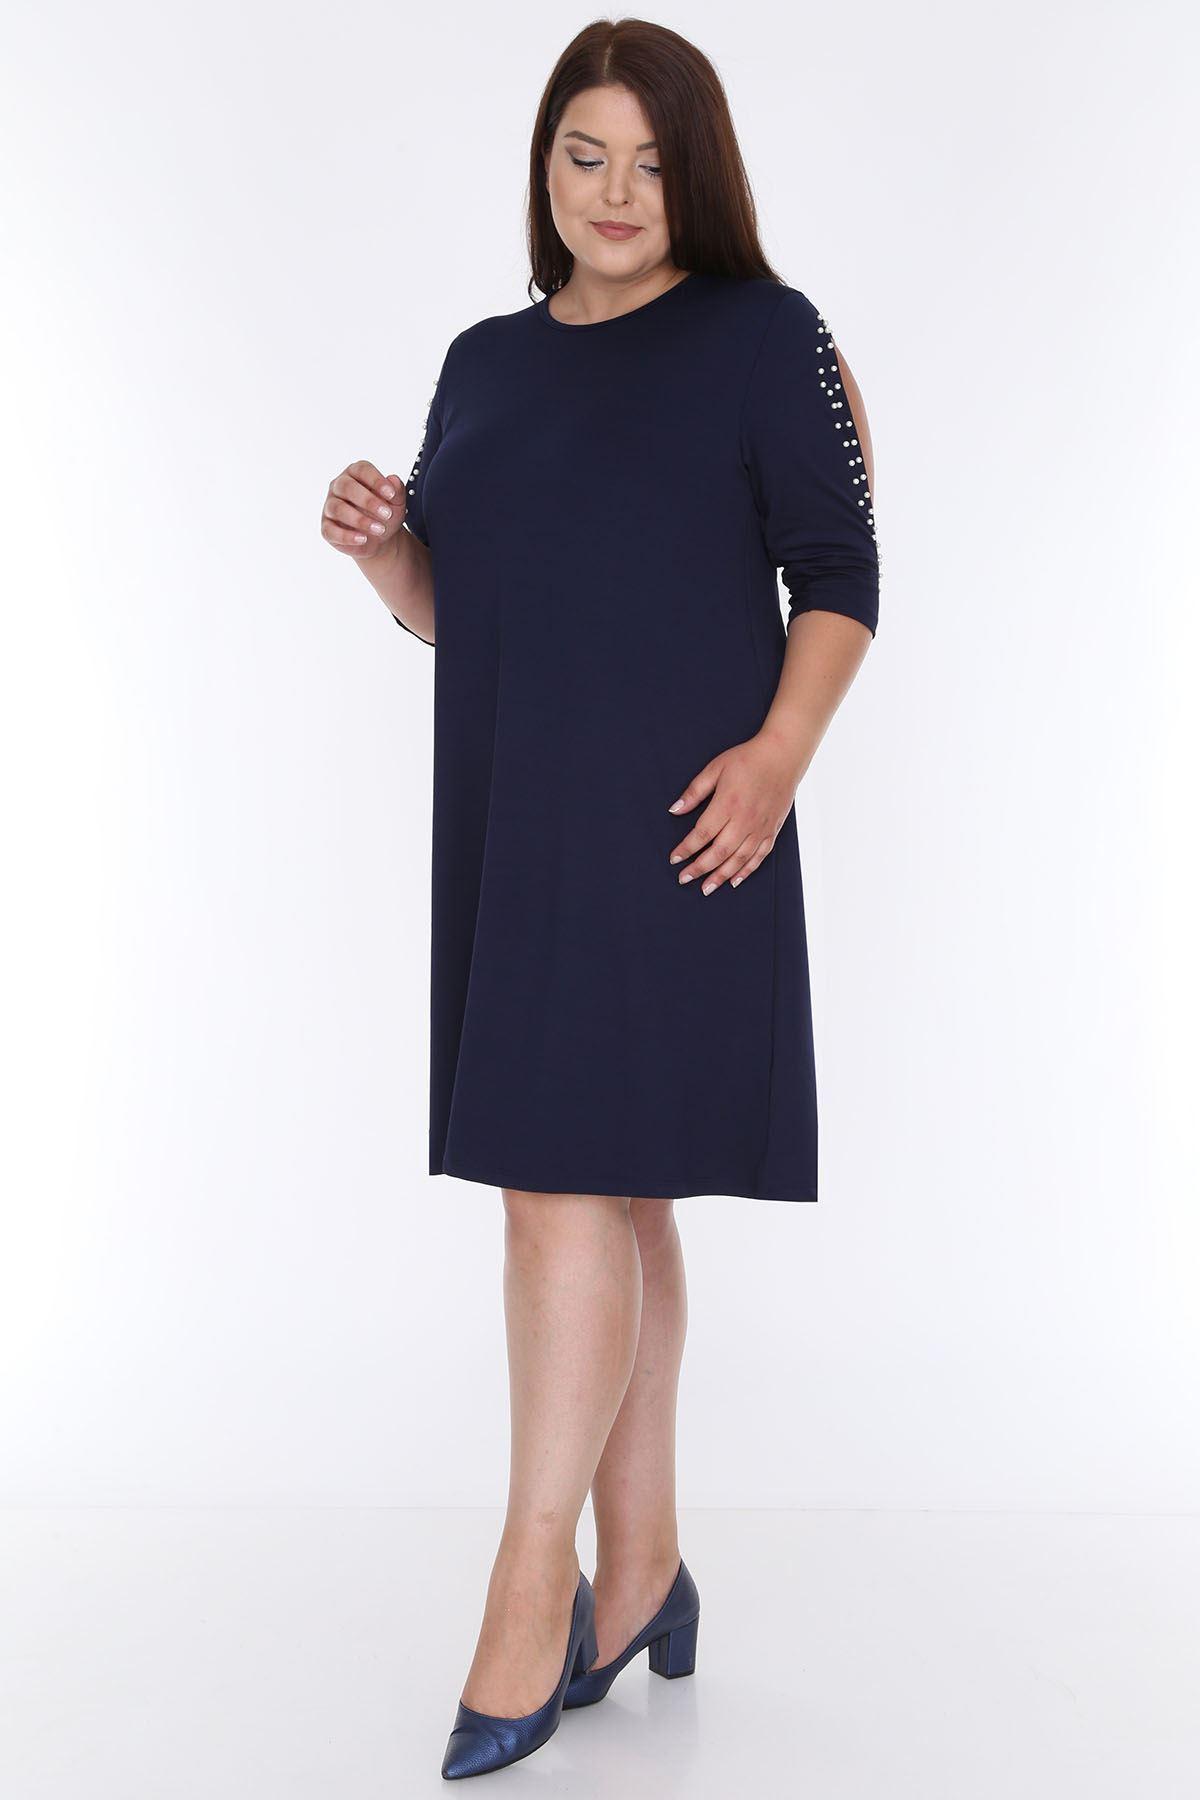 Kol İncili Lacivert Elbise 6E-0607